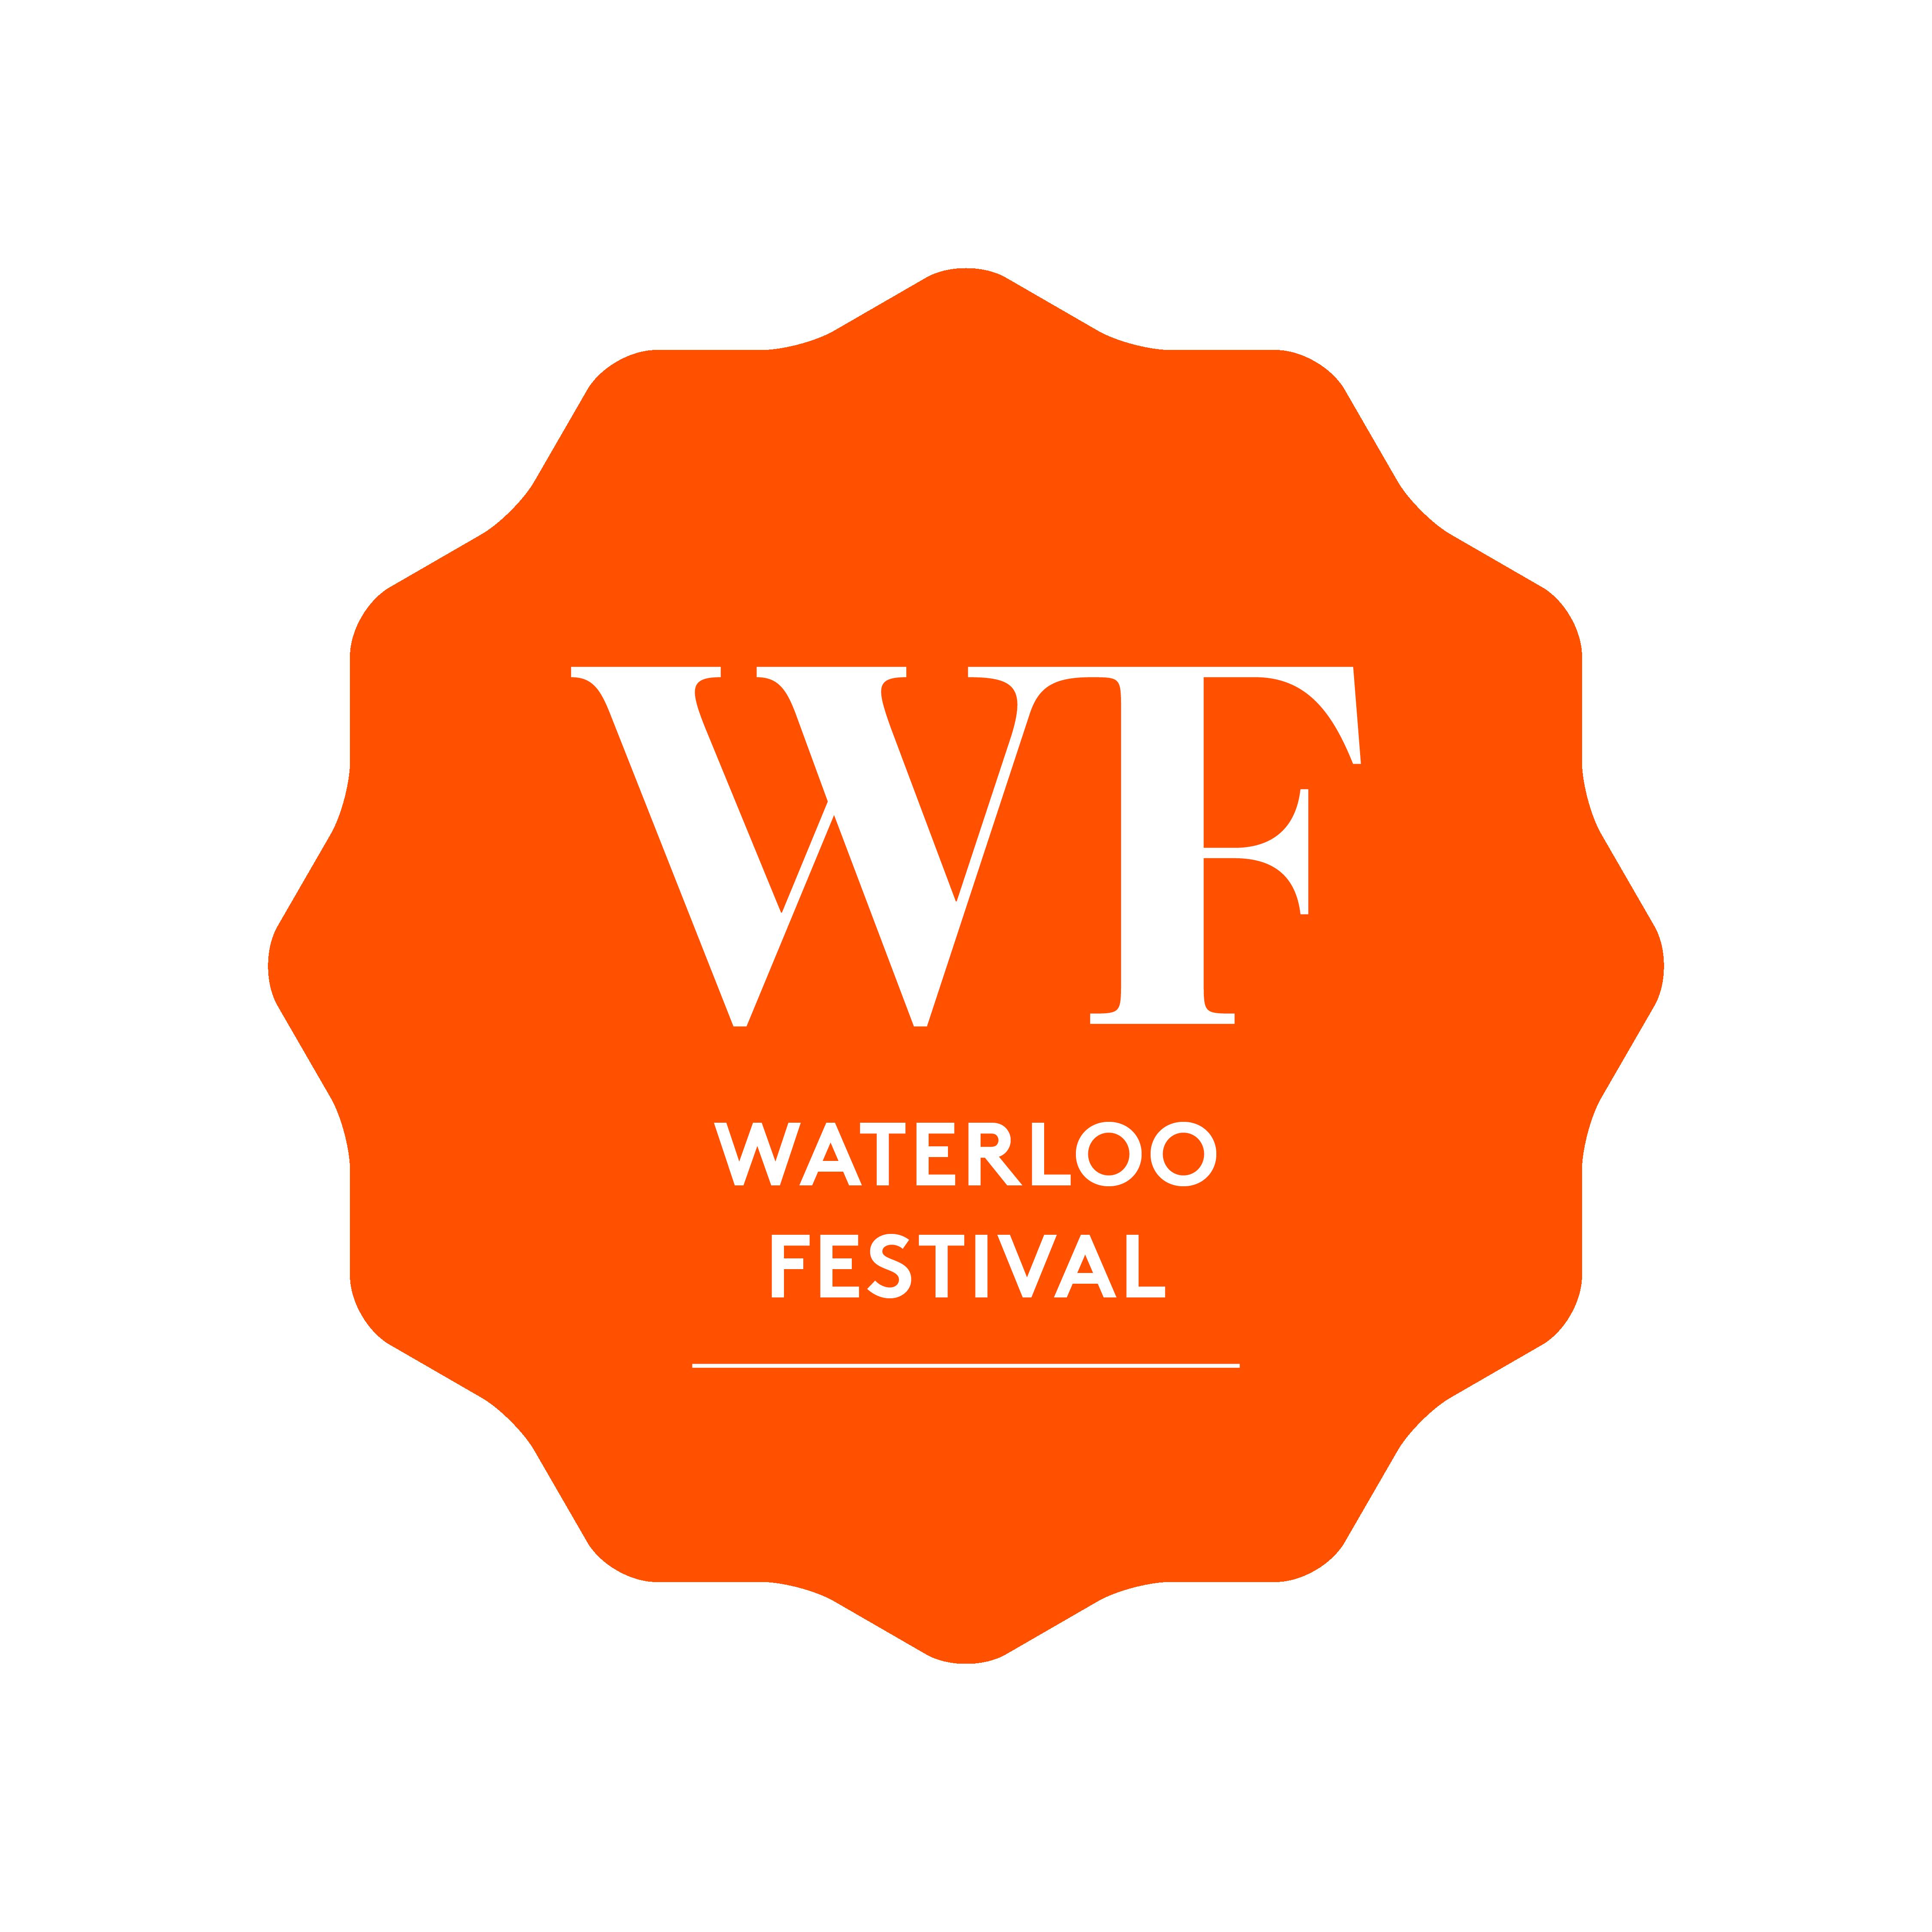 Waterloo Festival - FESTIVAL CEILIDH: ReIGNITE 2021 Transforming St John's Waterloo banner image